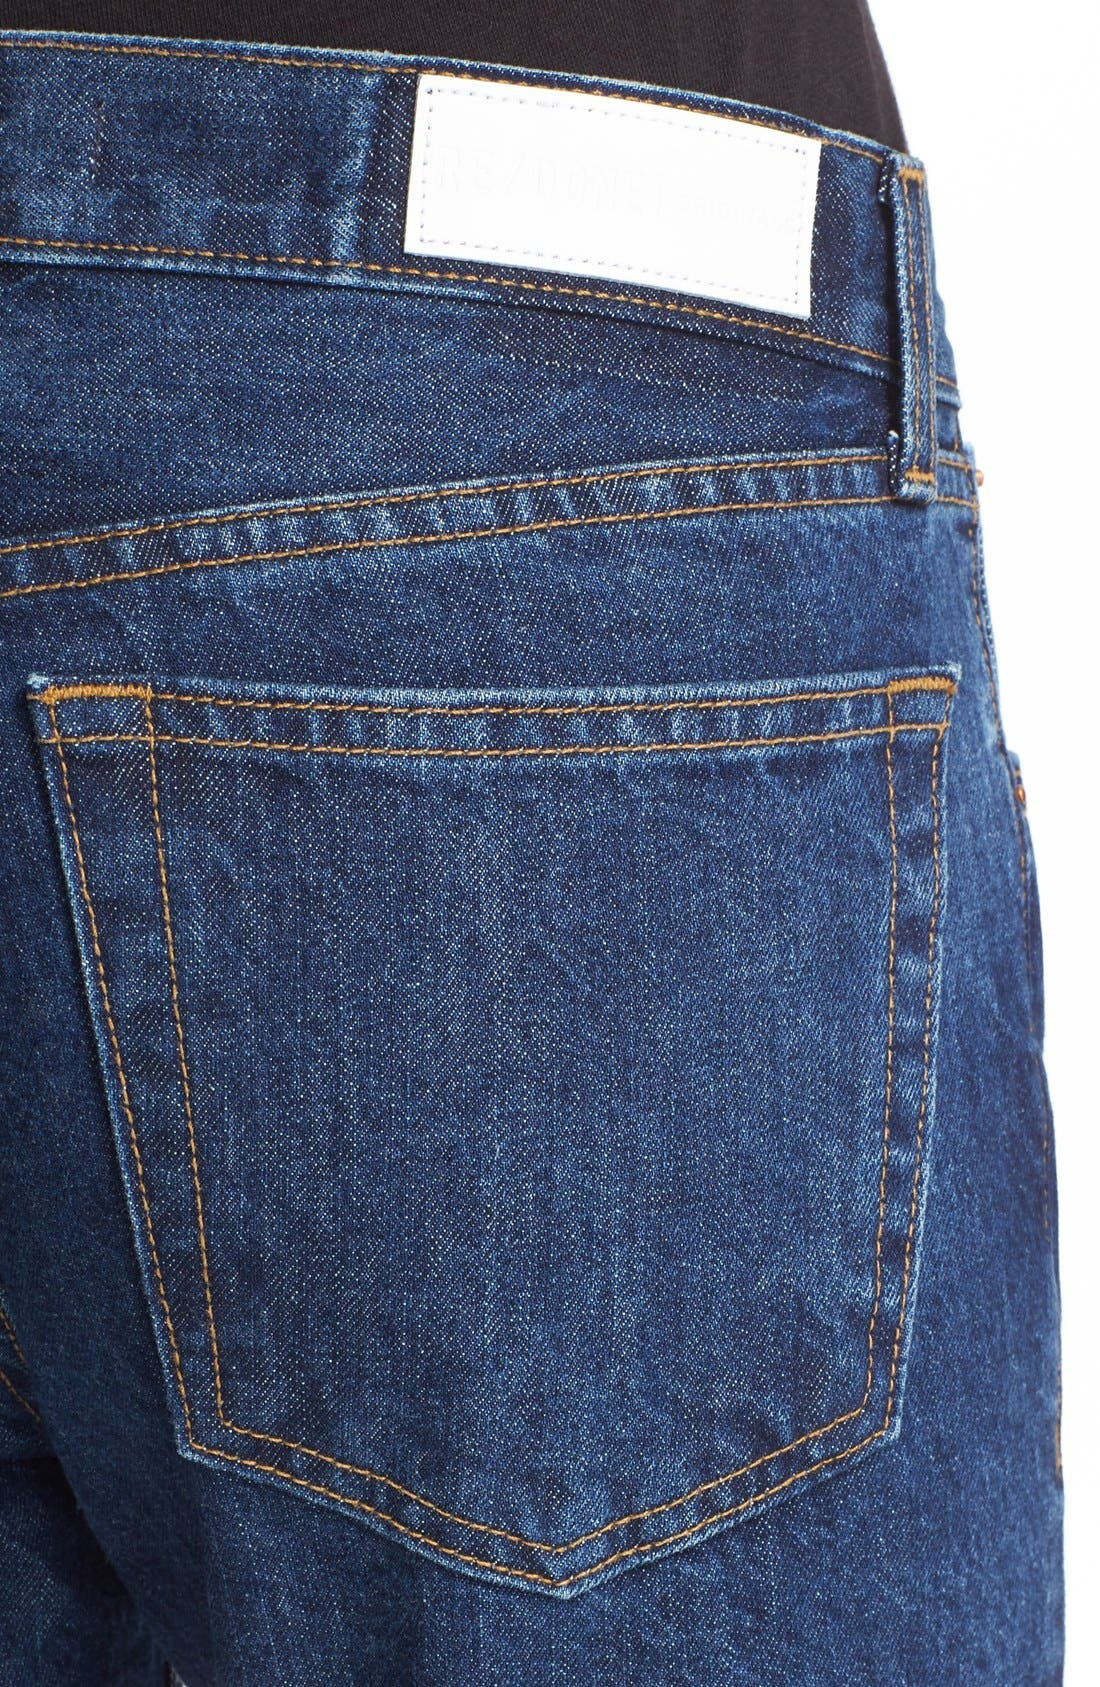 Originals High Waist Crop Jeans,                             Alternate thumbnail 4, color,                             Dark